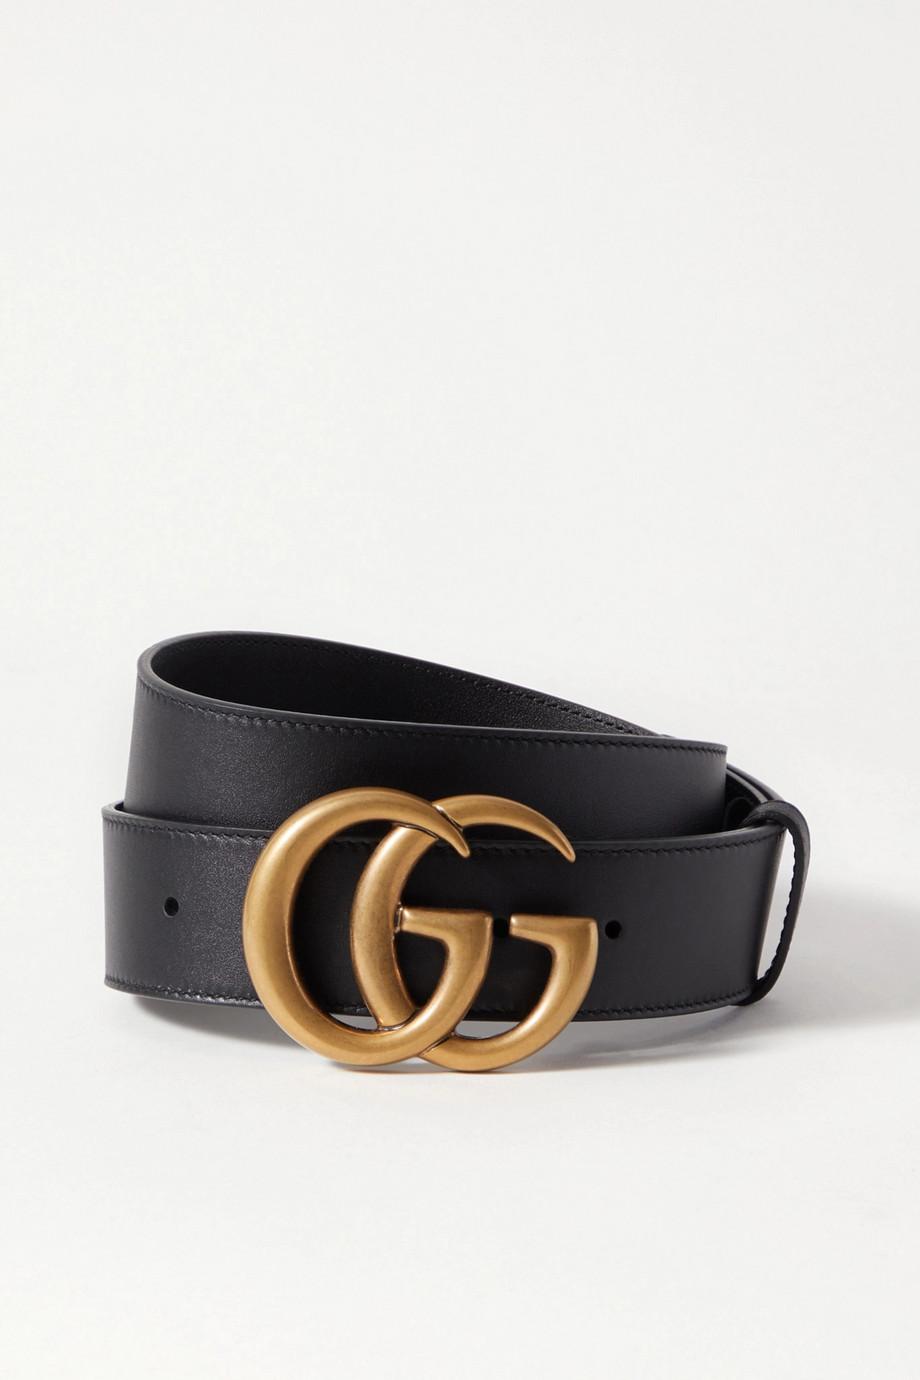 Gucci Leather Belt, Size: 65